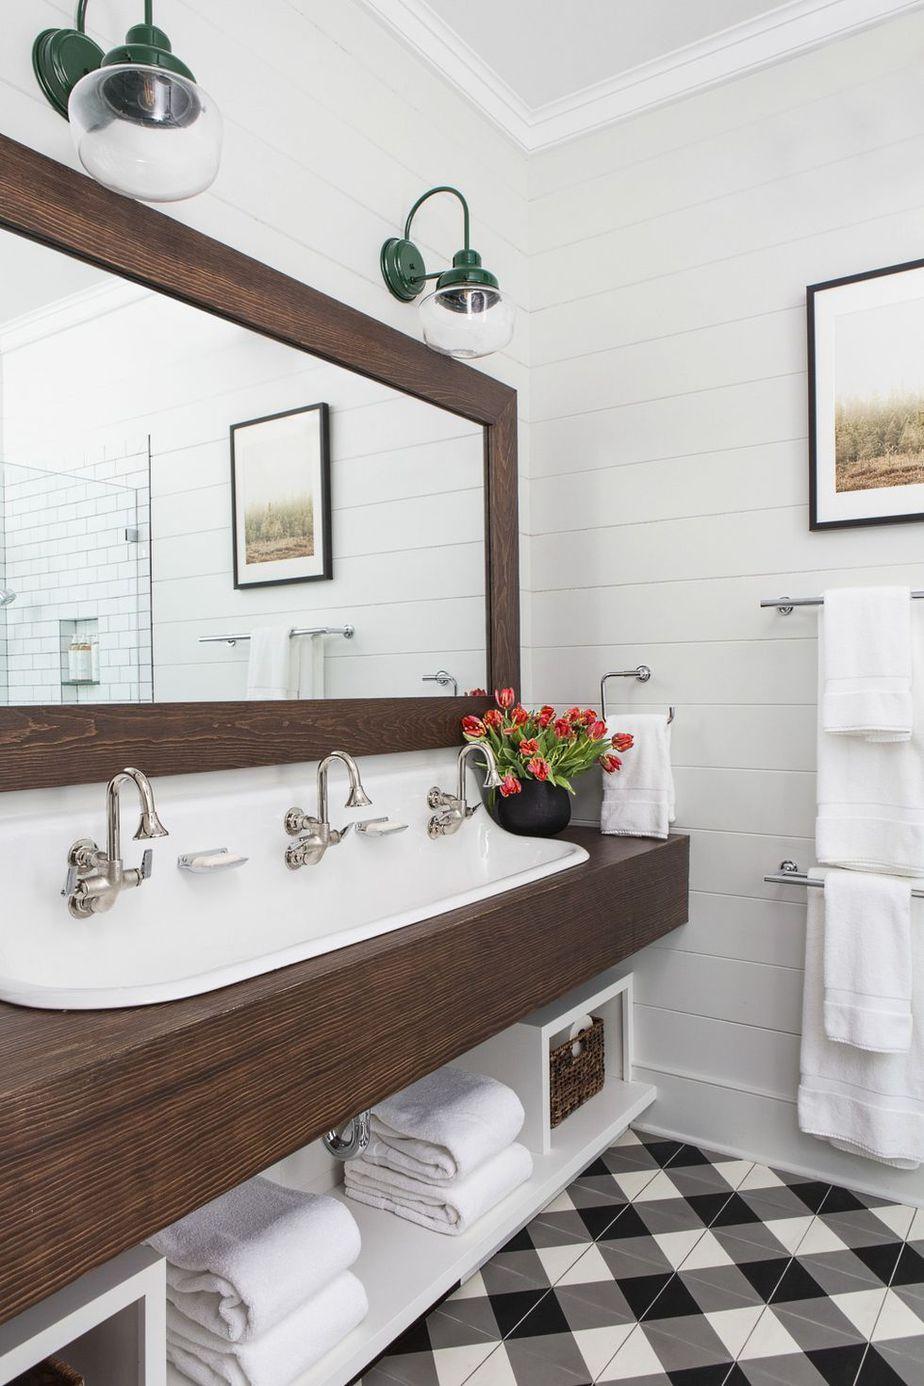 3.trough style sink by Simphome.com